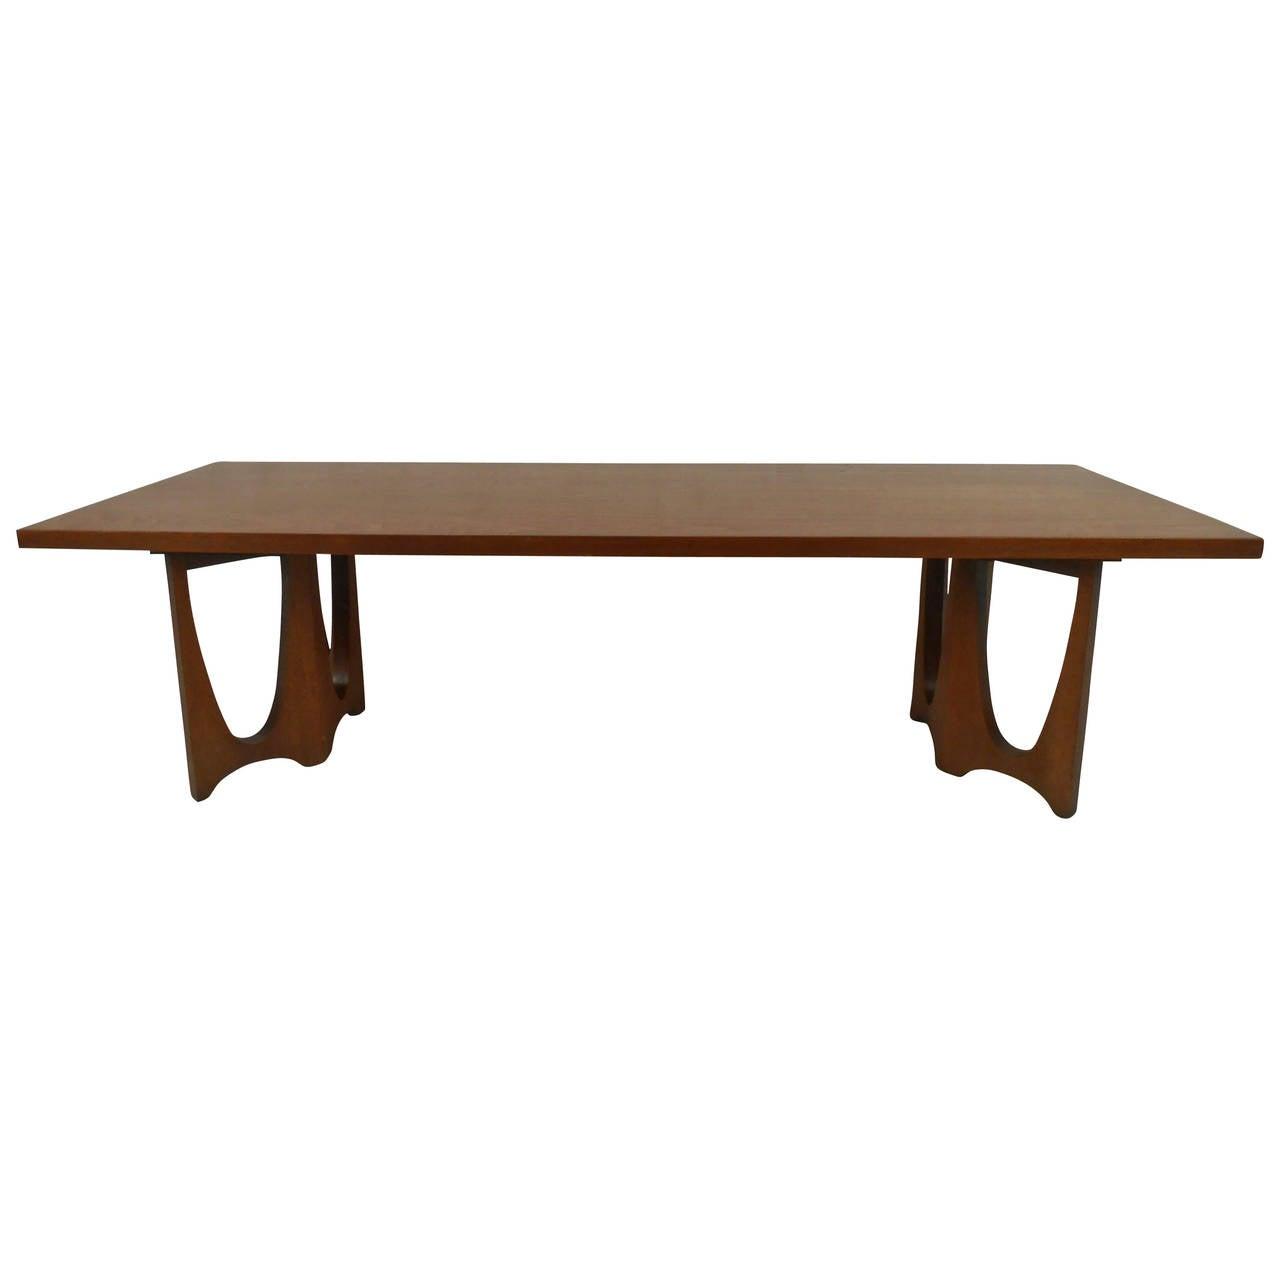 Midcentury Walnut Coffee Table By The J.B. Van Sciver